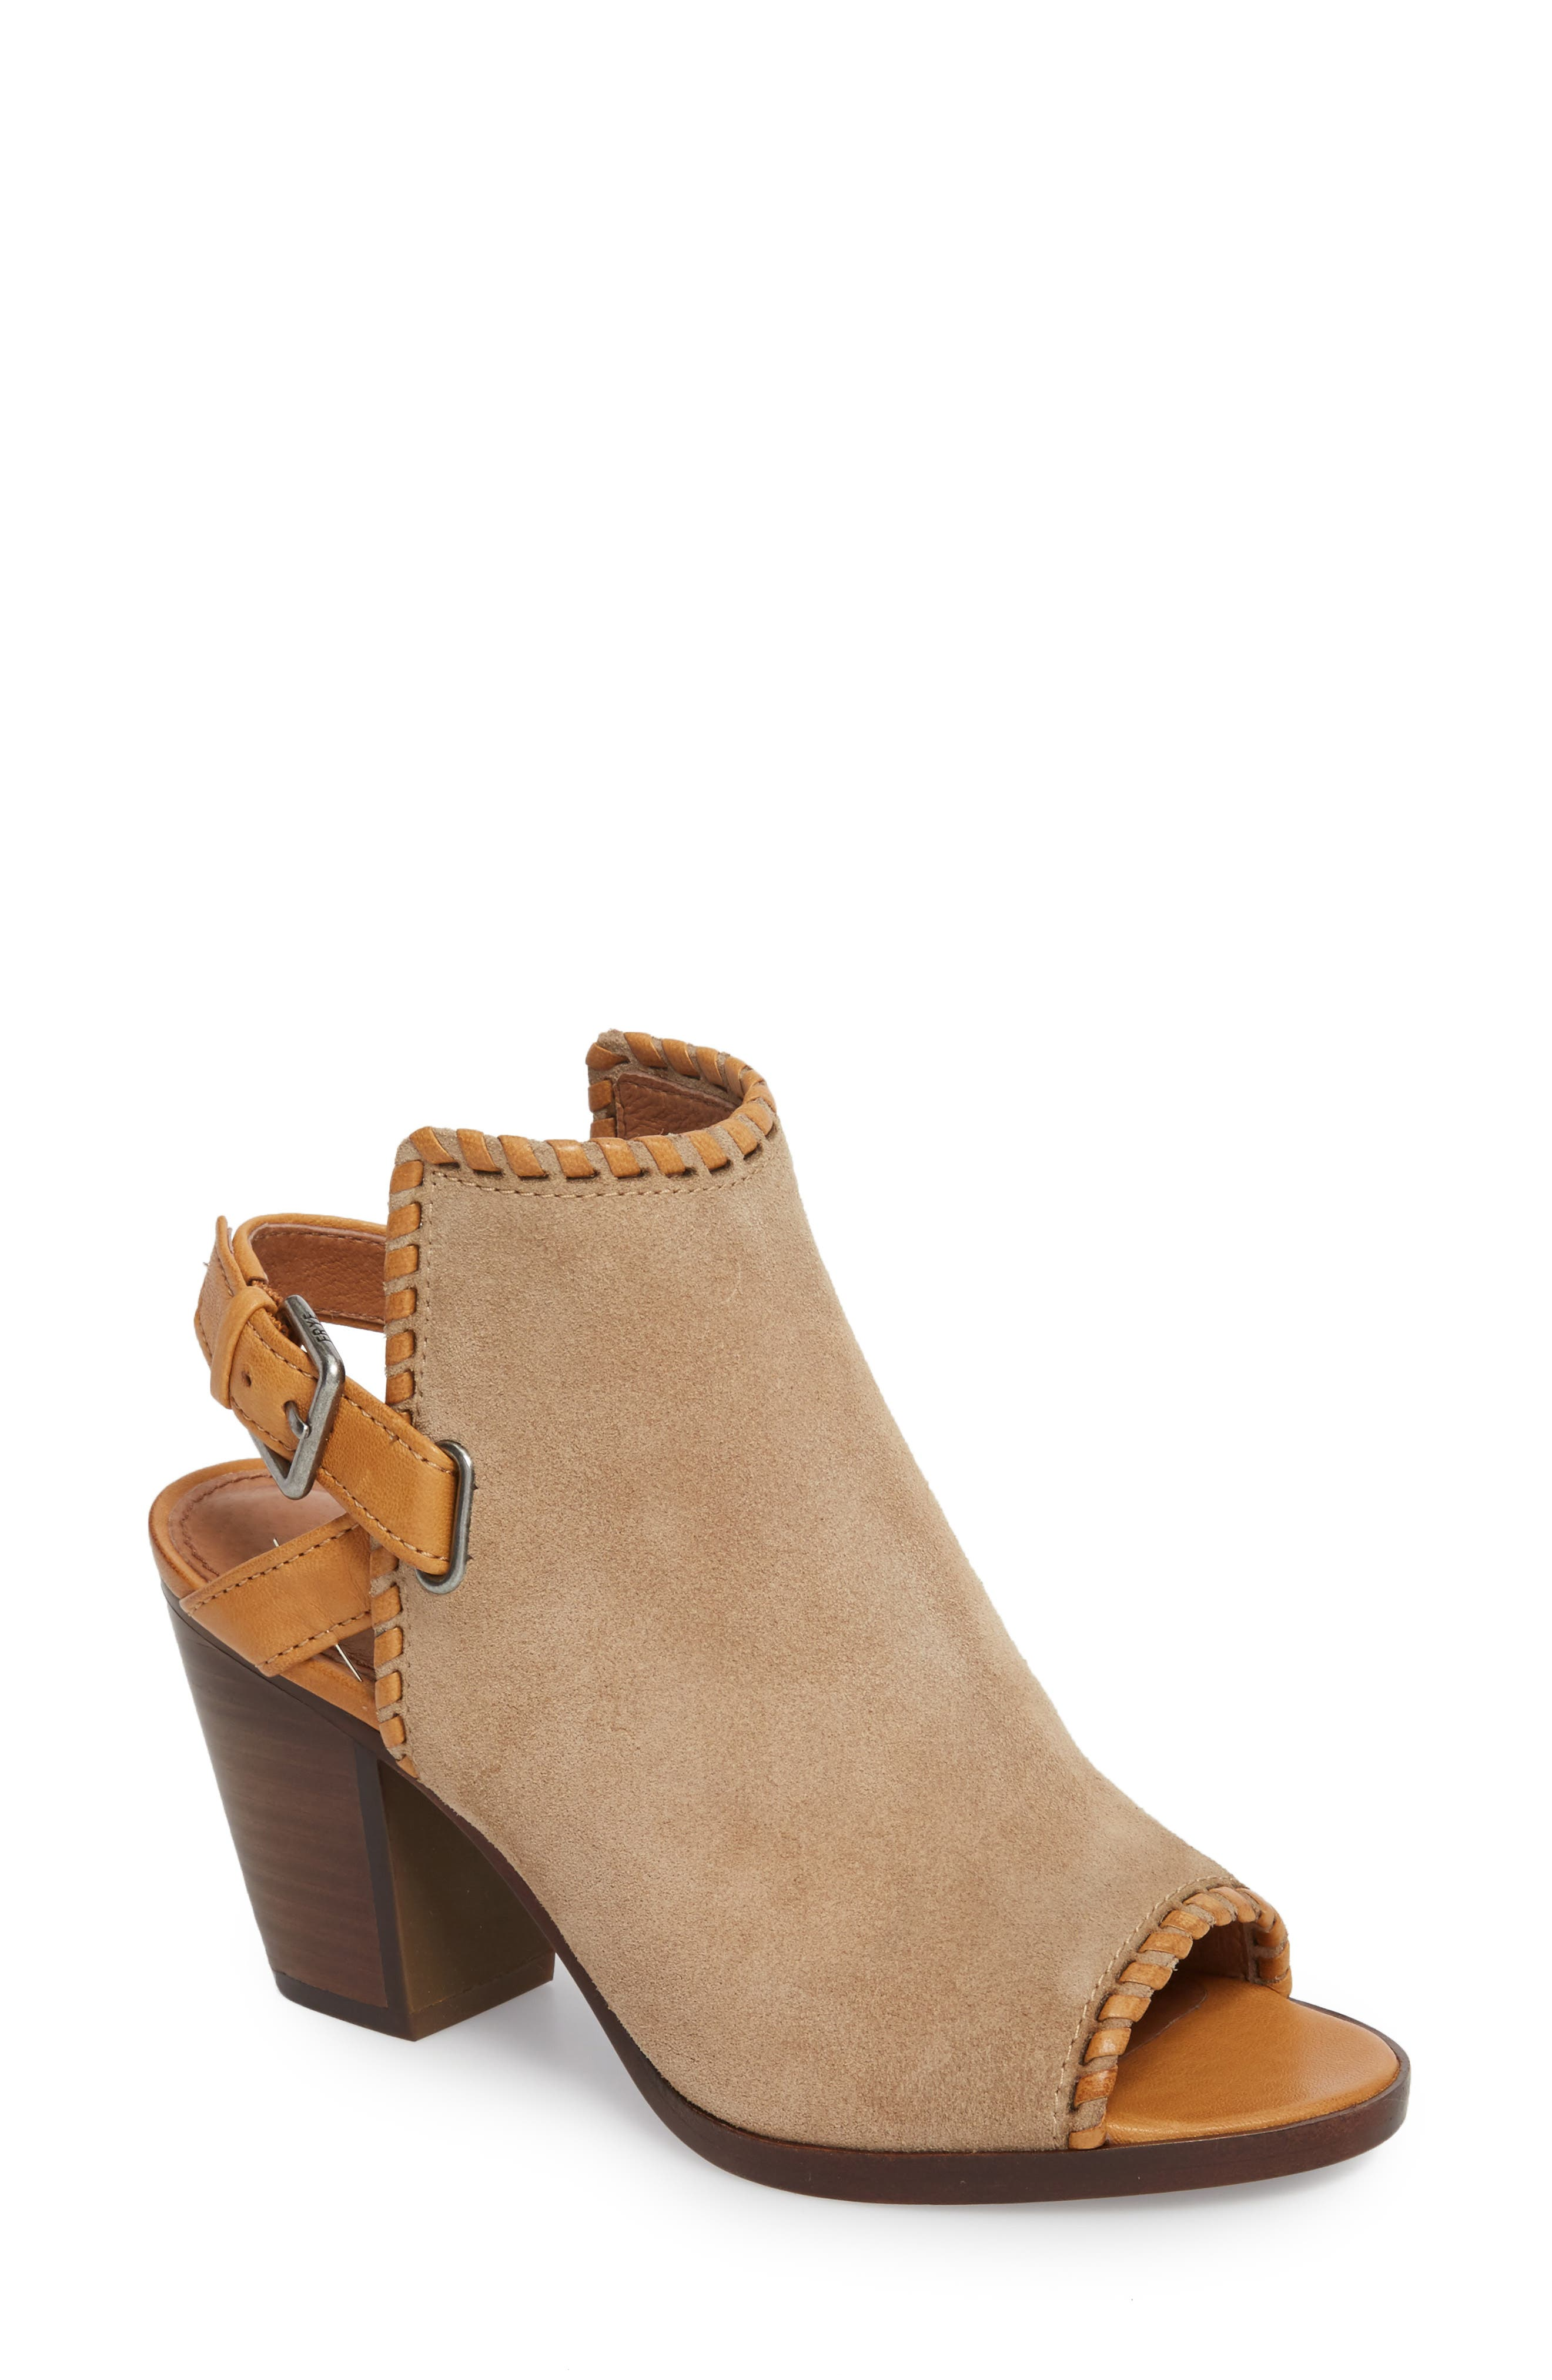 Dani Shield Sandal,                         Main,                         color, Beige Suede